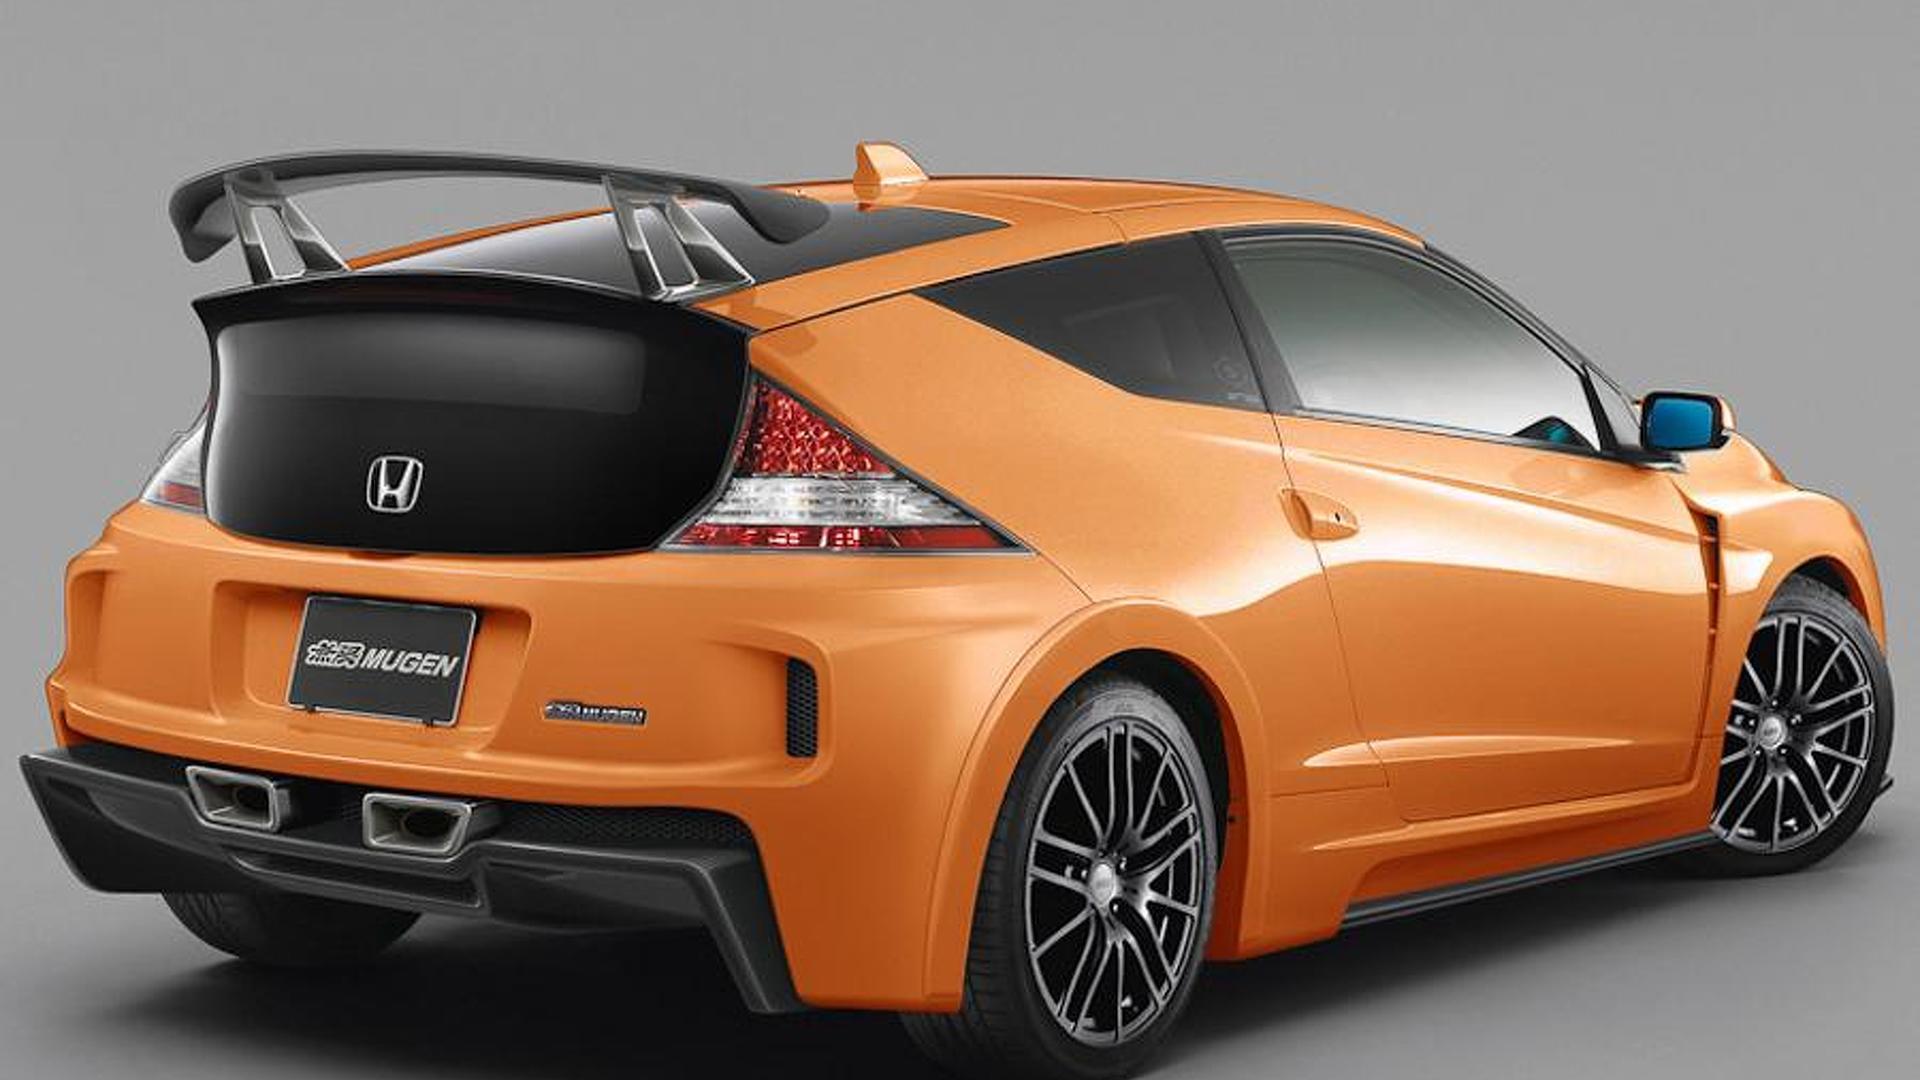 Honda CR-Z MUGEN RR Concept revealed in Goodwood